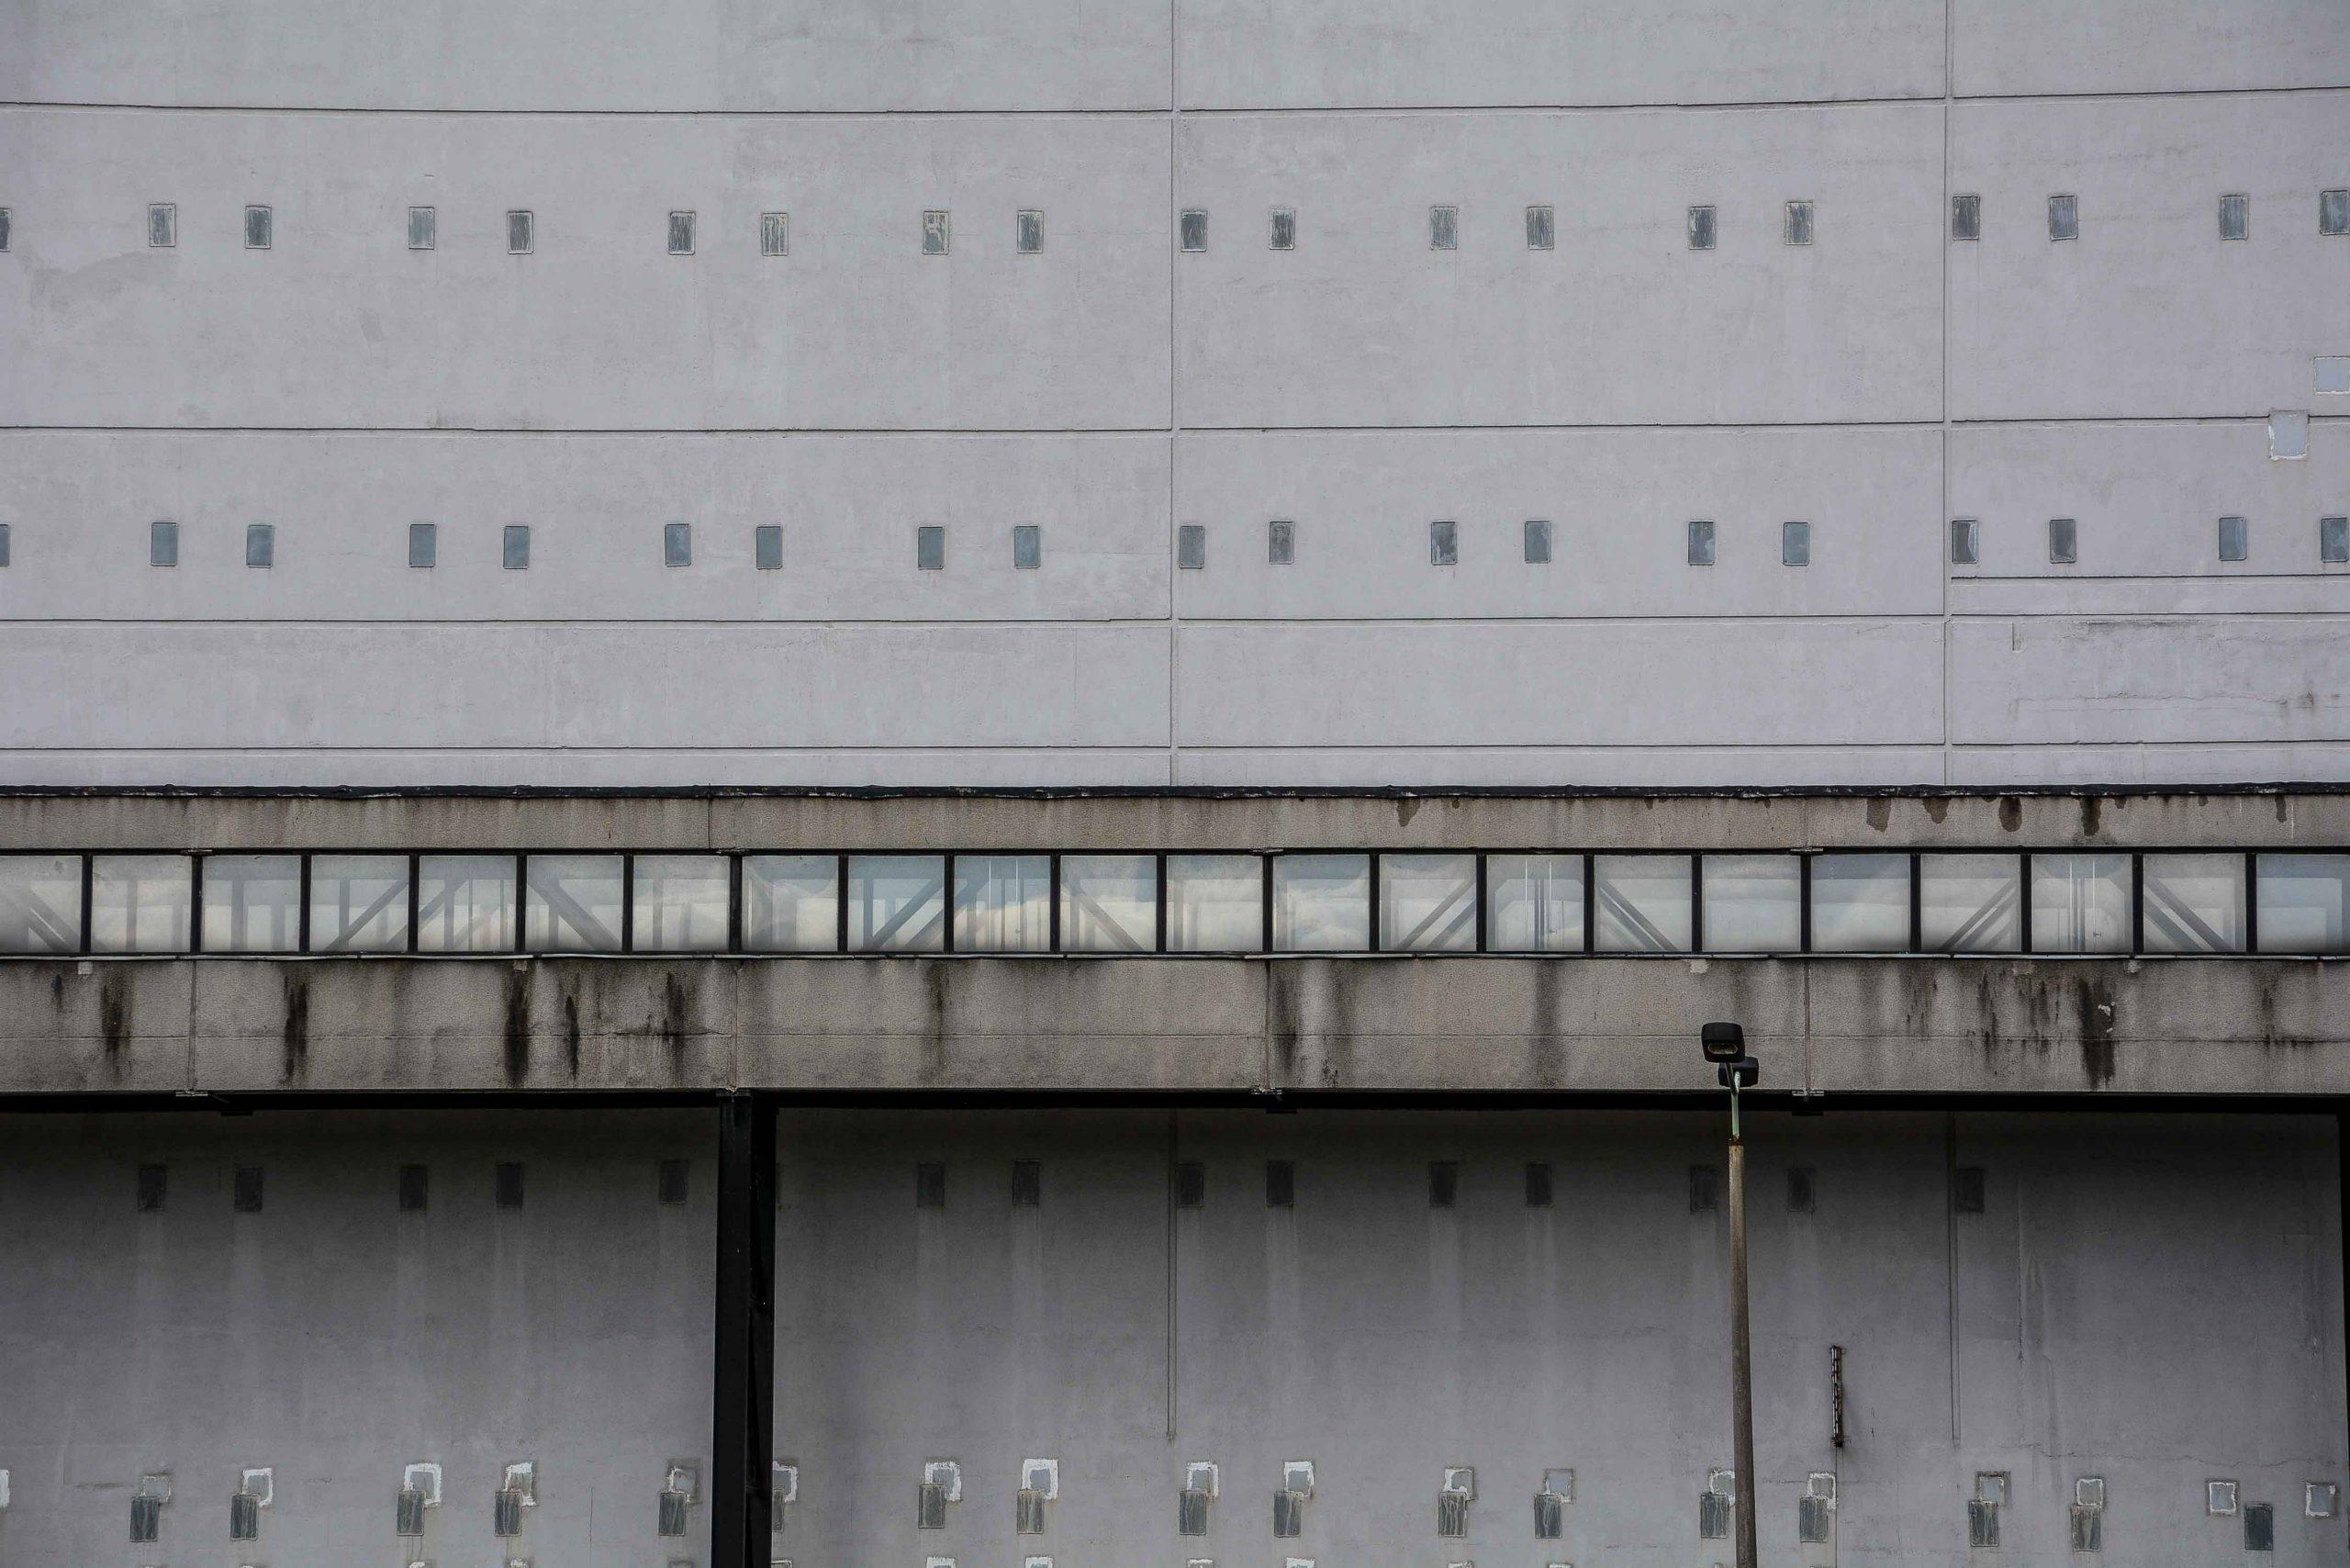 reactor block gangway kernkraftwerk greifswald nuclear powerplant ost deutschland east germany gdr DDR mecklenburg vorpommern